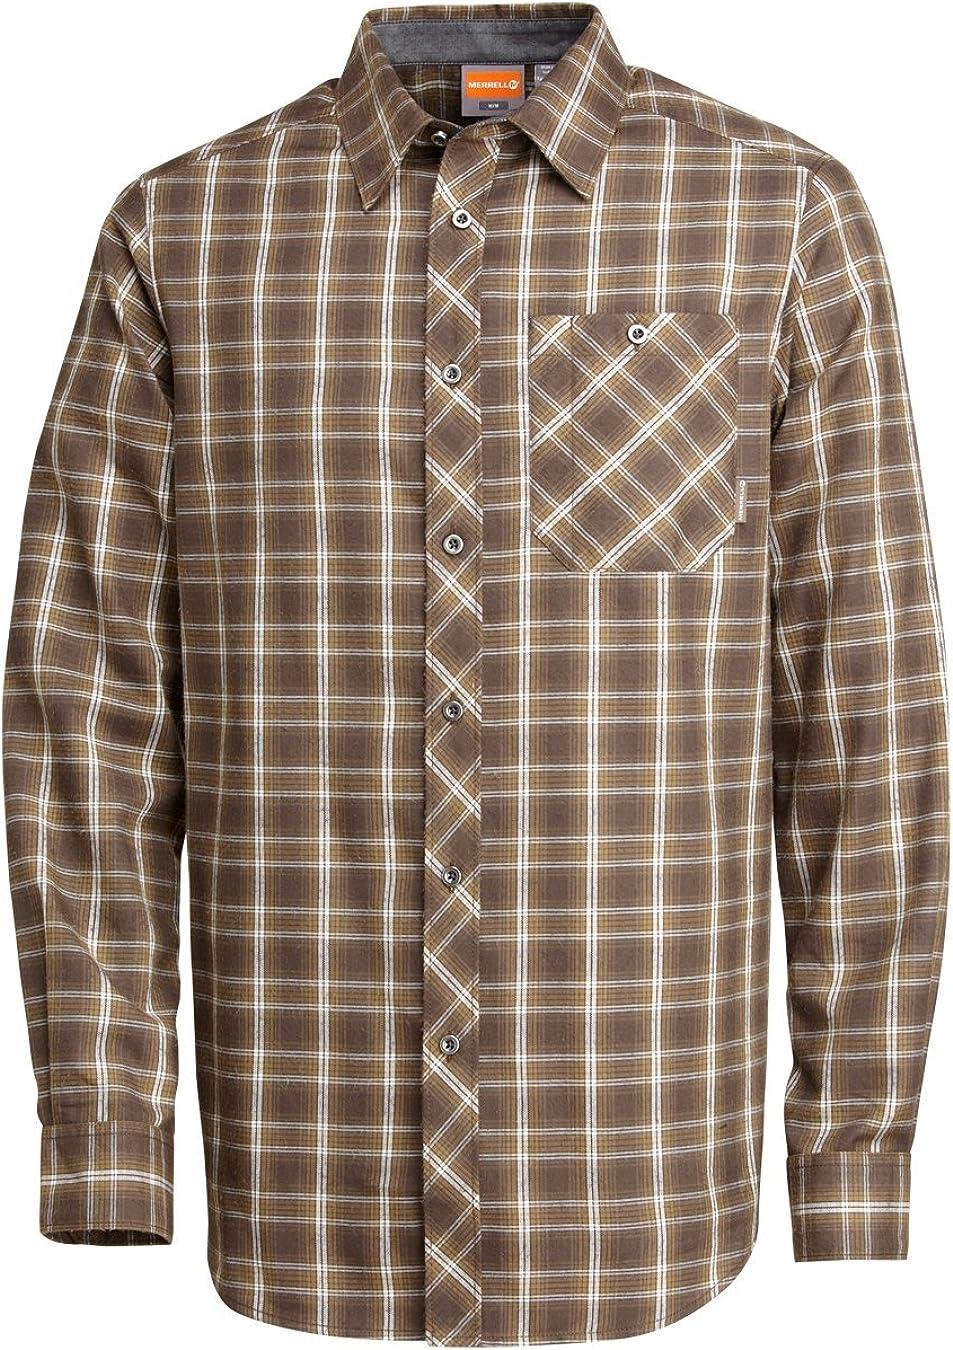 Merrell Men's Talin Shirt Under blast Japan's largest assortment sales Pullsaw X-Large